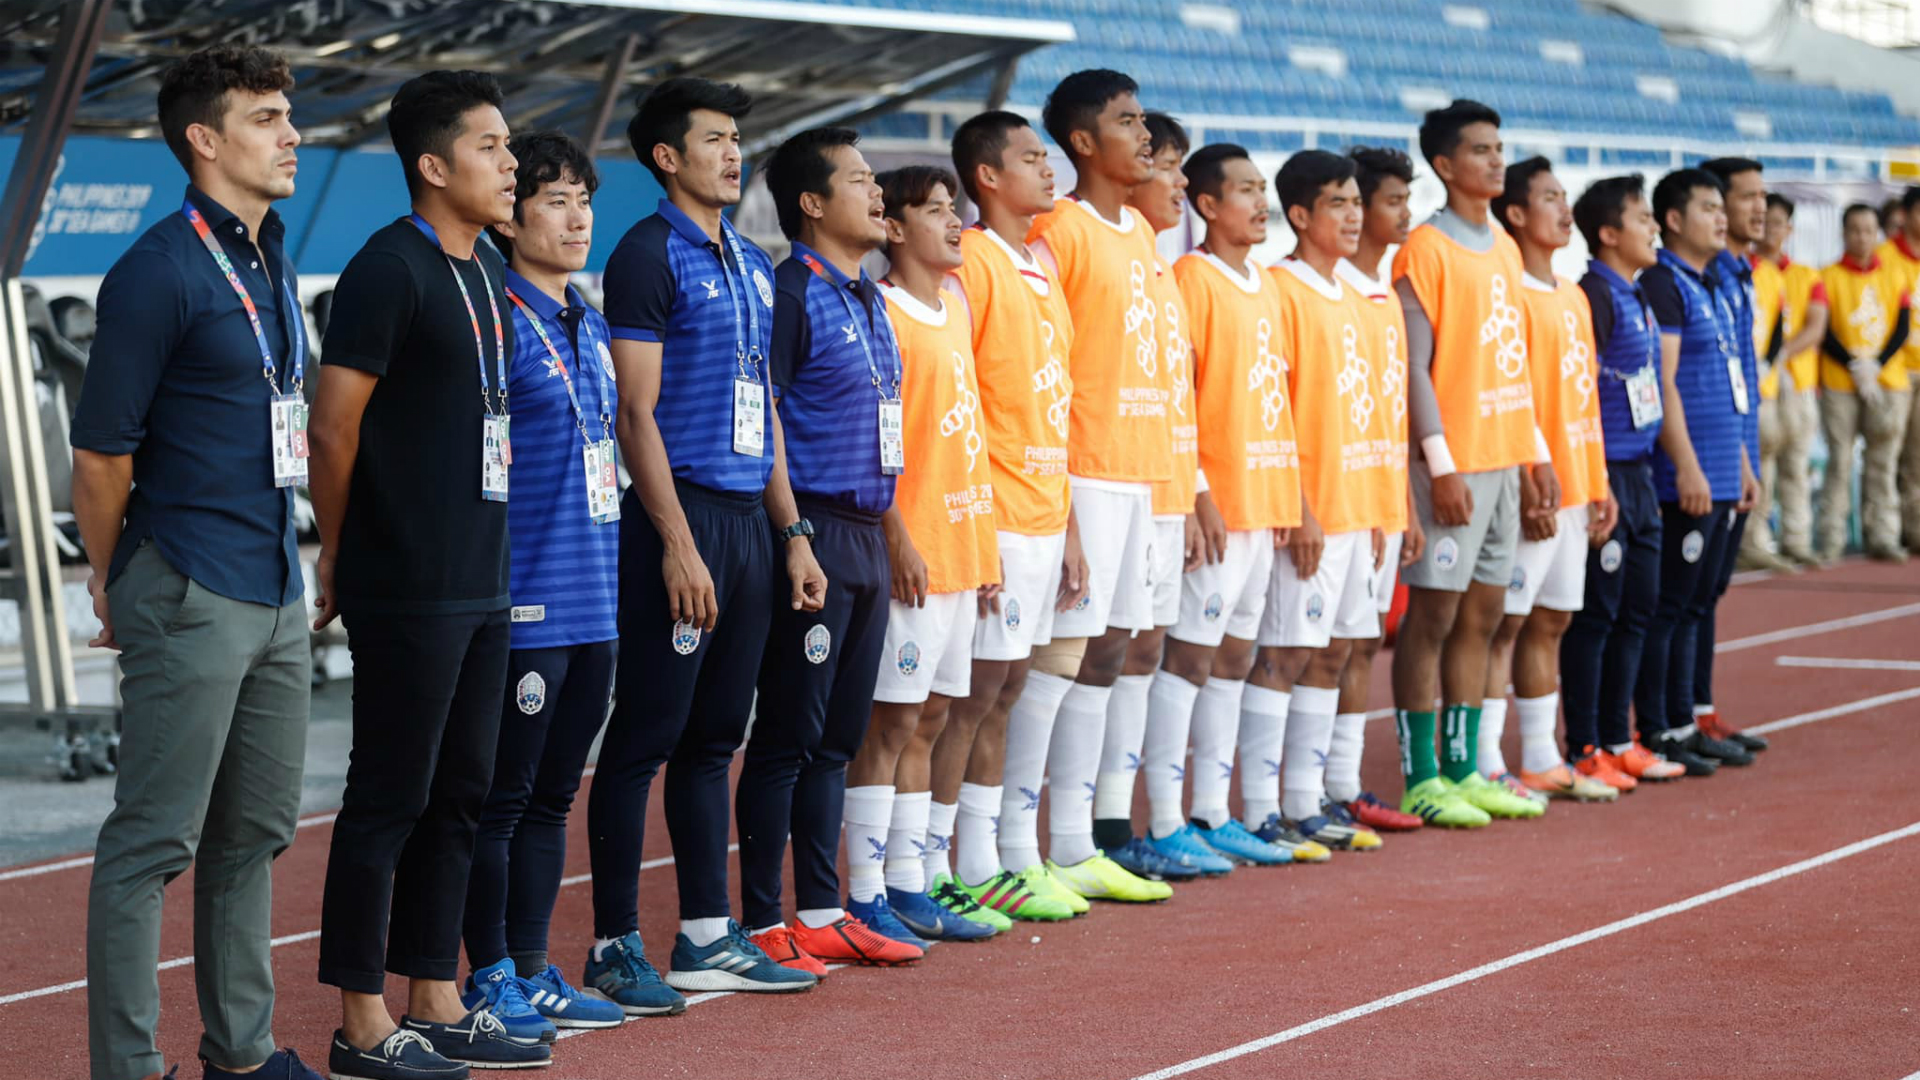 Felix Dalmas, Cambodia v Malaysia, SEA Games 2019, 4 Dec 2019